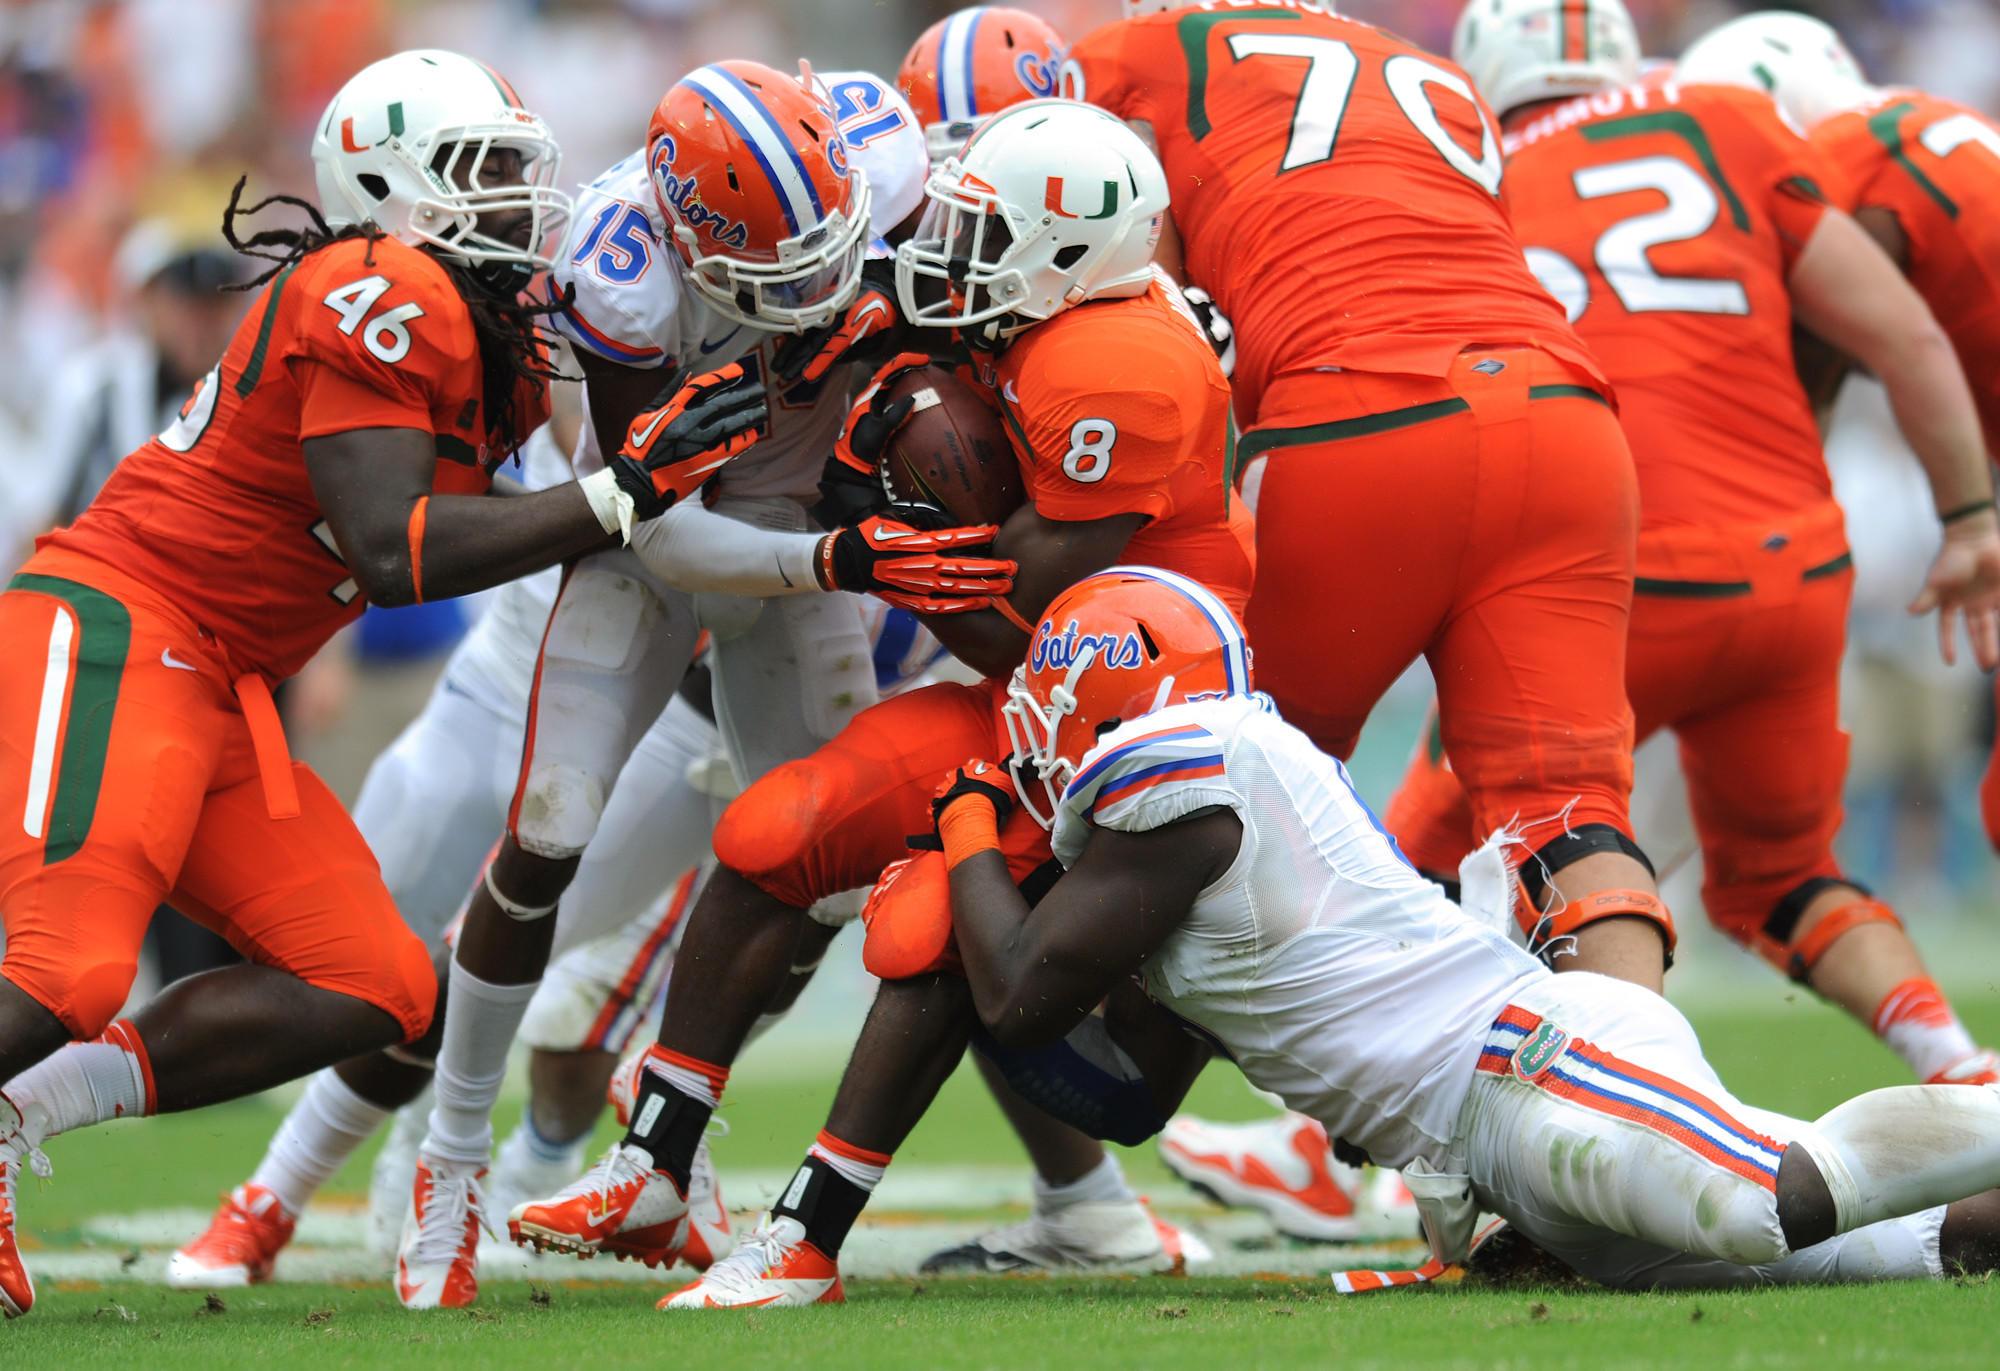 Duke Johnson gets bottled up by the Florida defense in the second half. University of Florida vs. University of Miami. Sun Life Stadium, Miami Gardens, FL 9/7/13. Jim Rassol, Sun Sentinel..